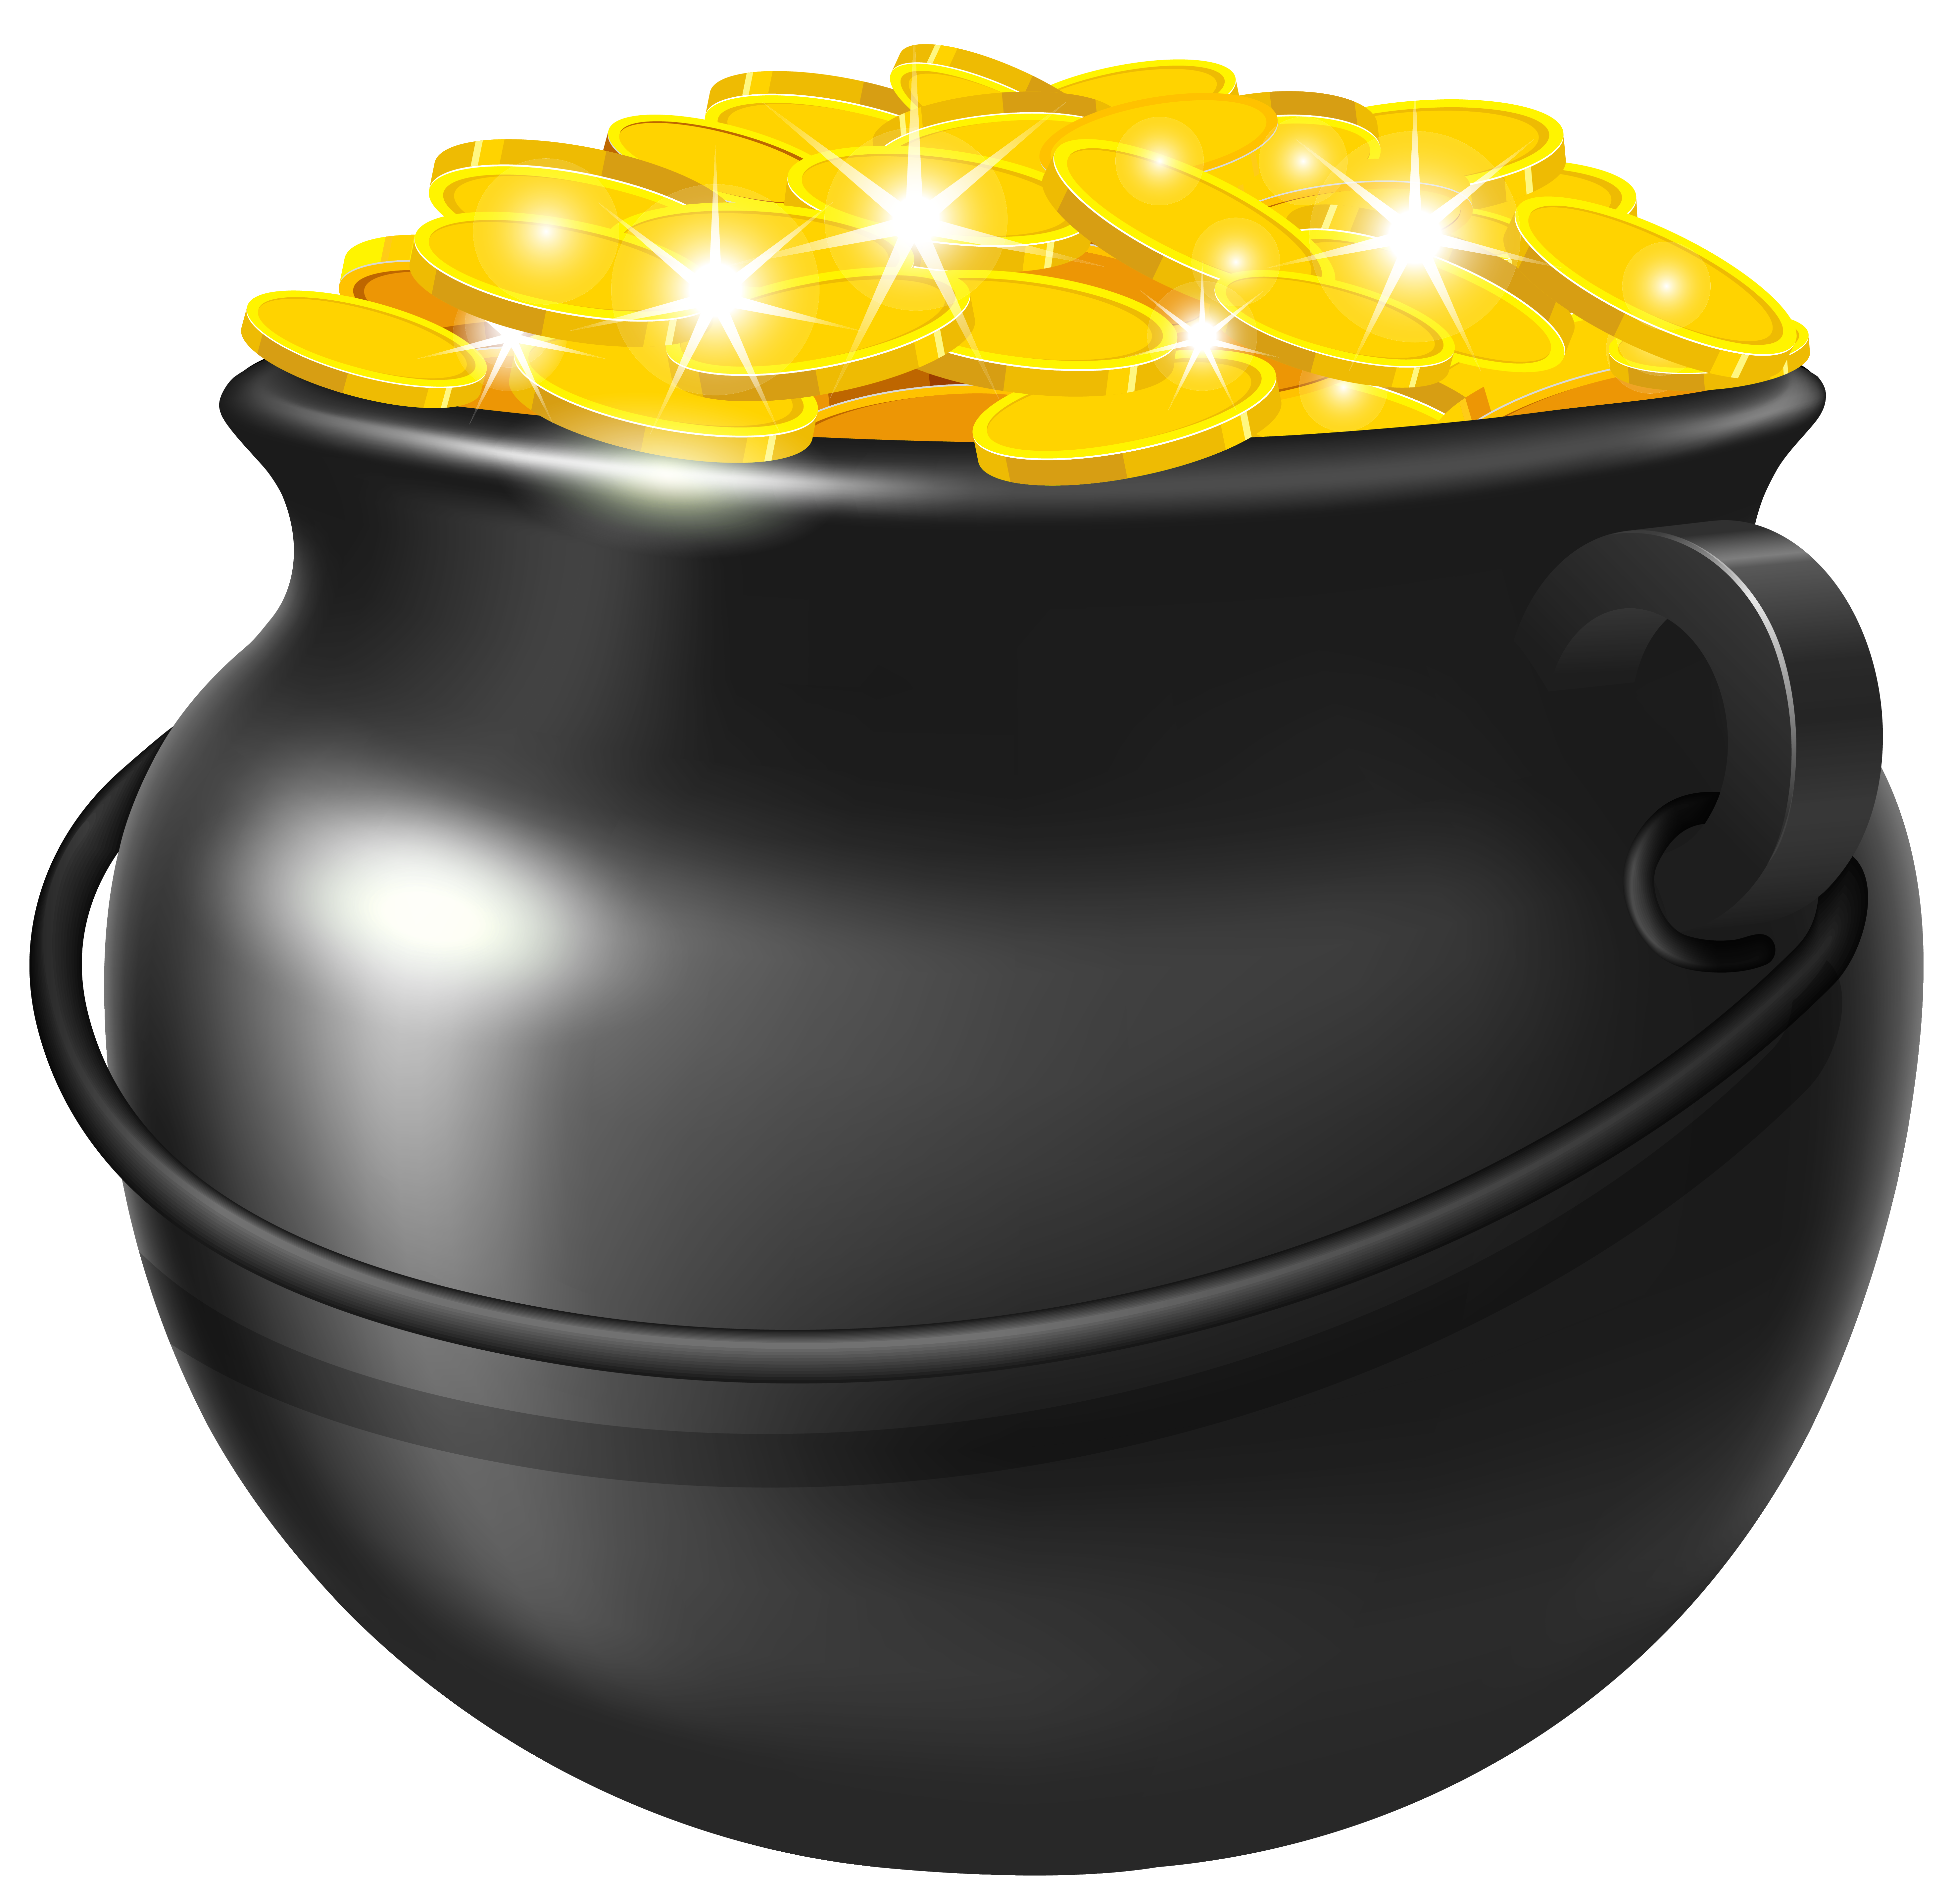 Black Pot of Gold PNG Clipart Image.